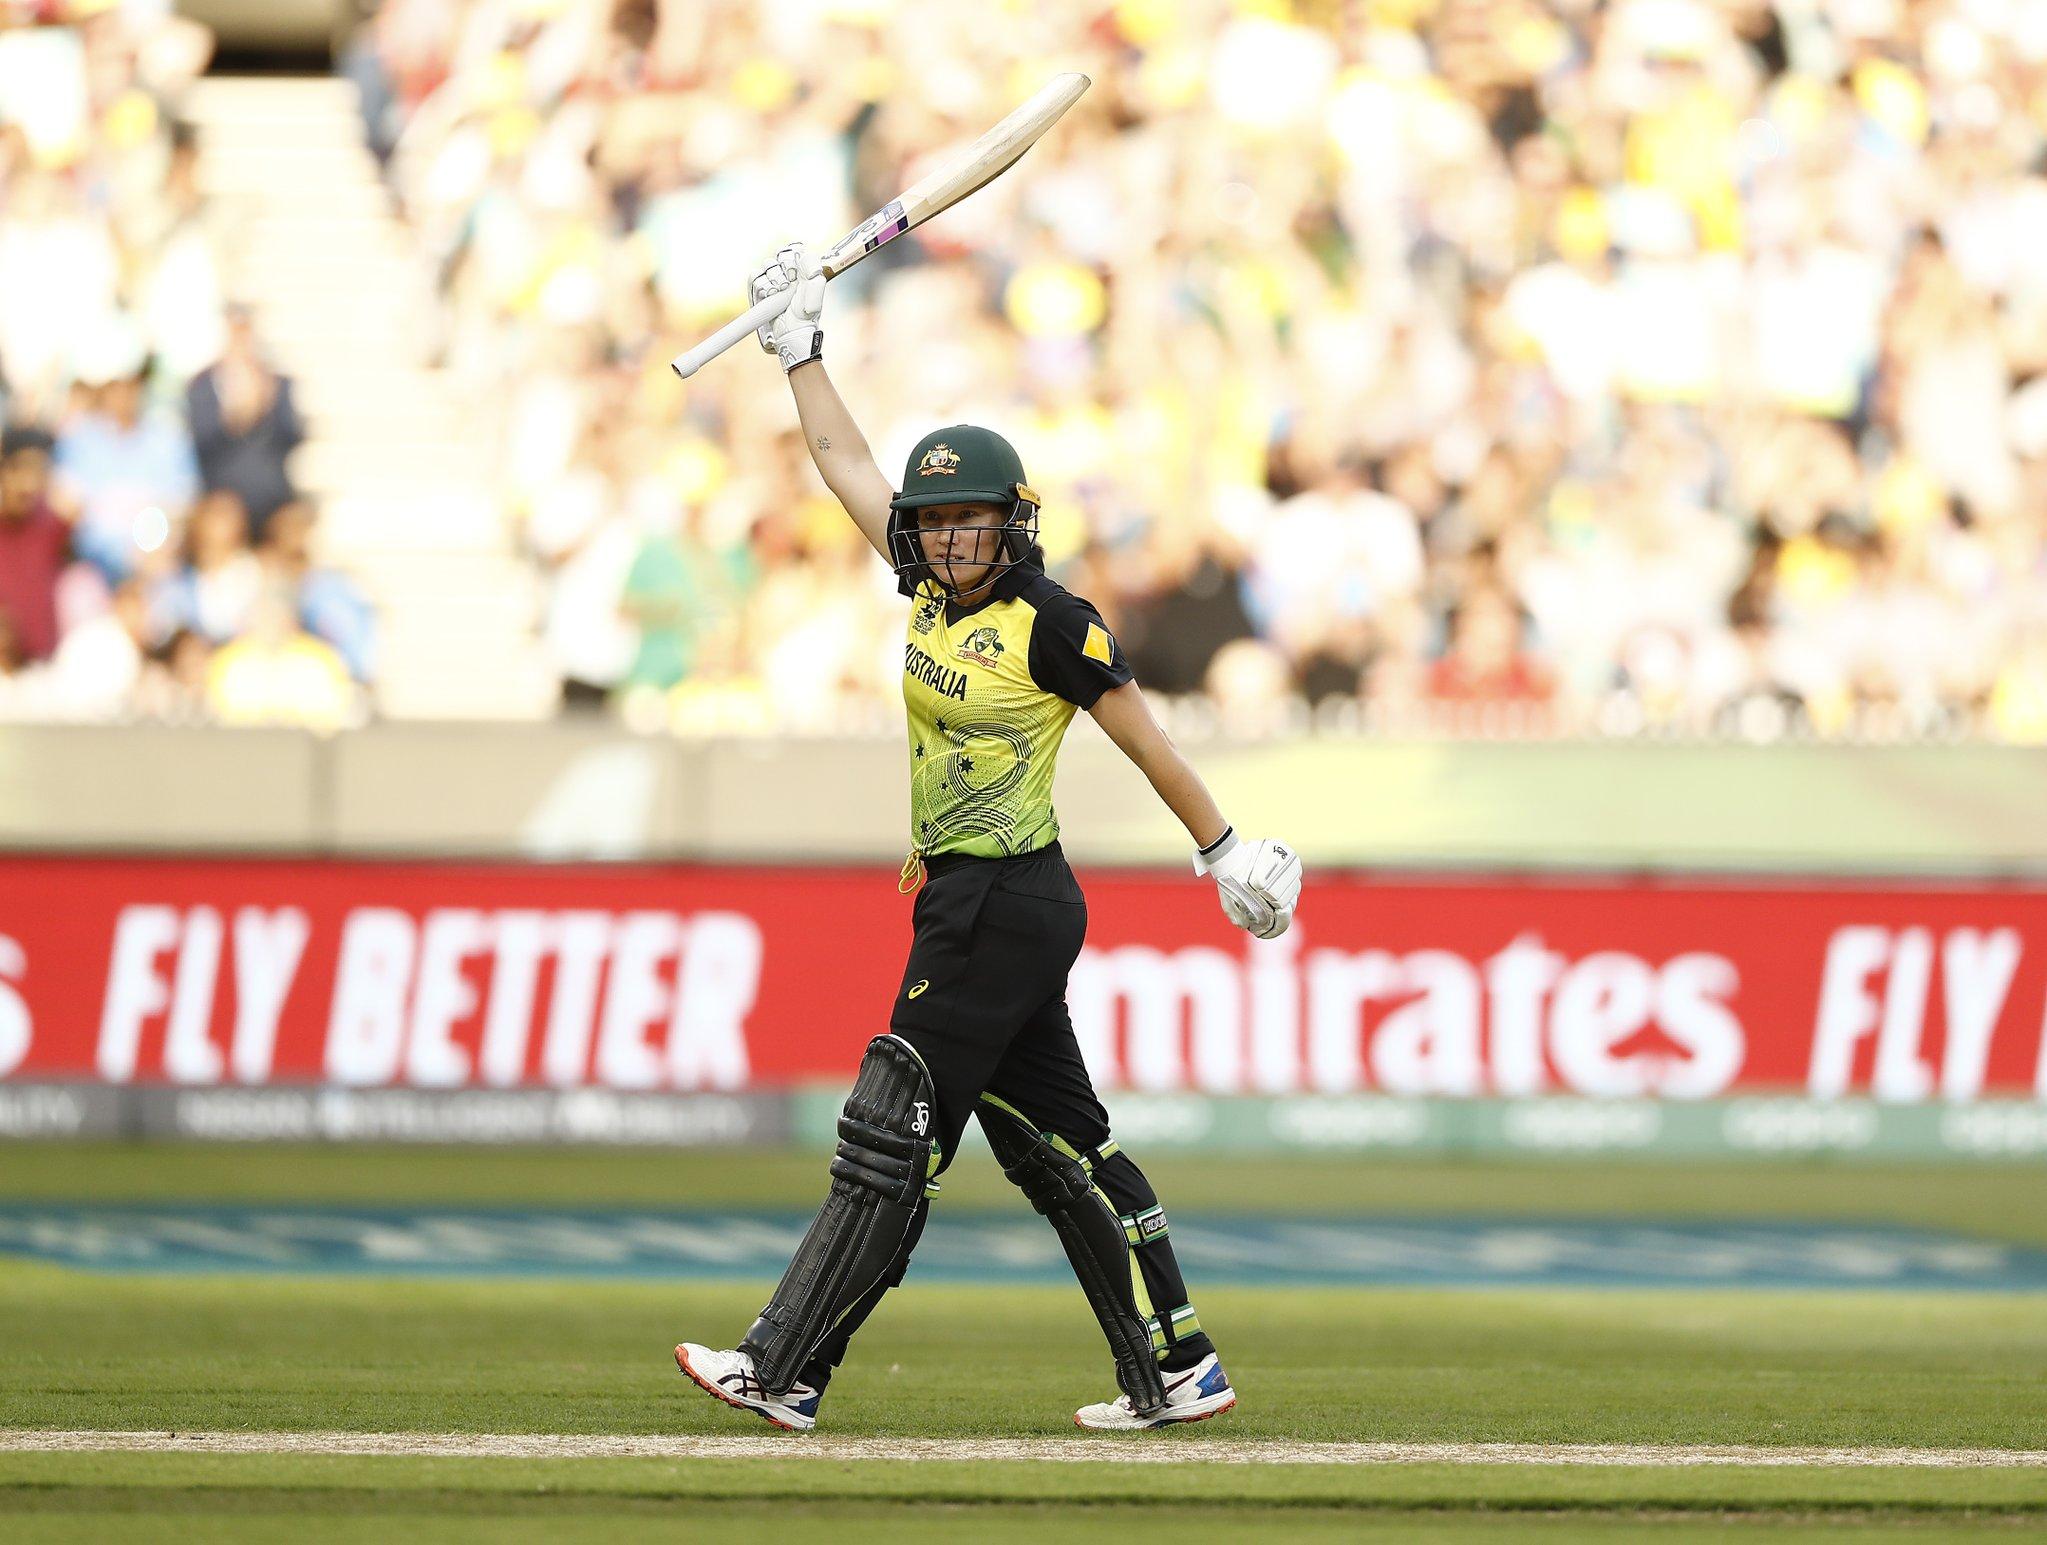 Healy scored 75 runs